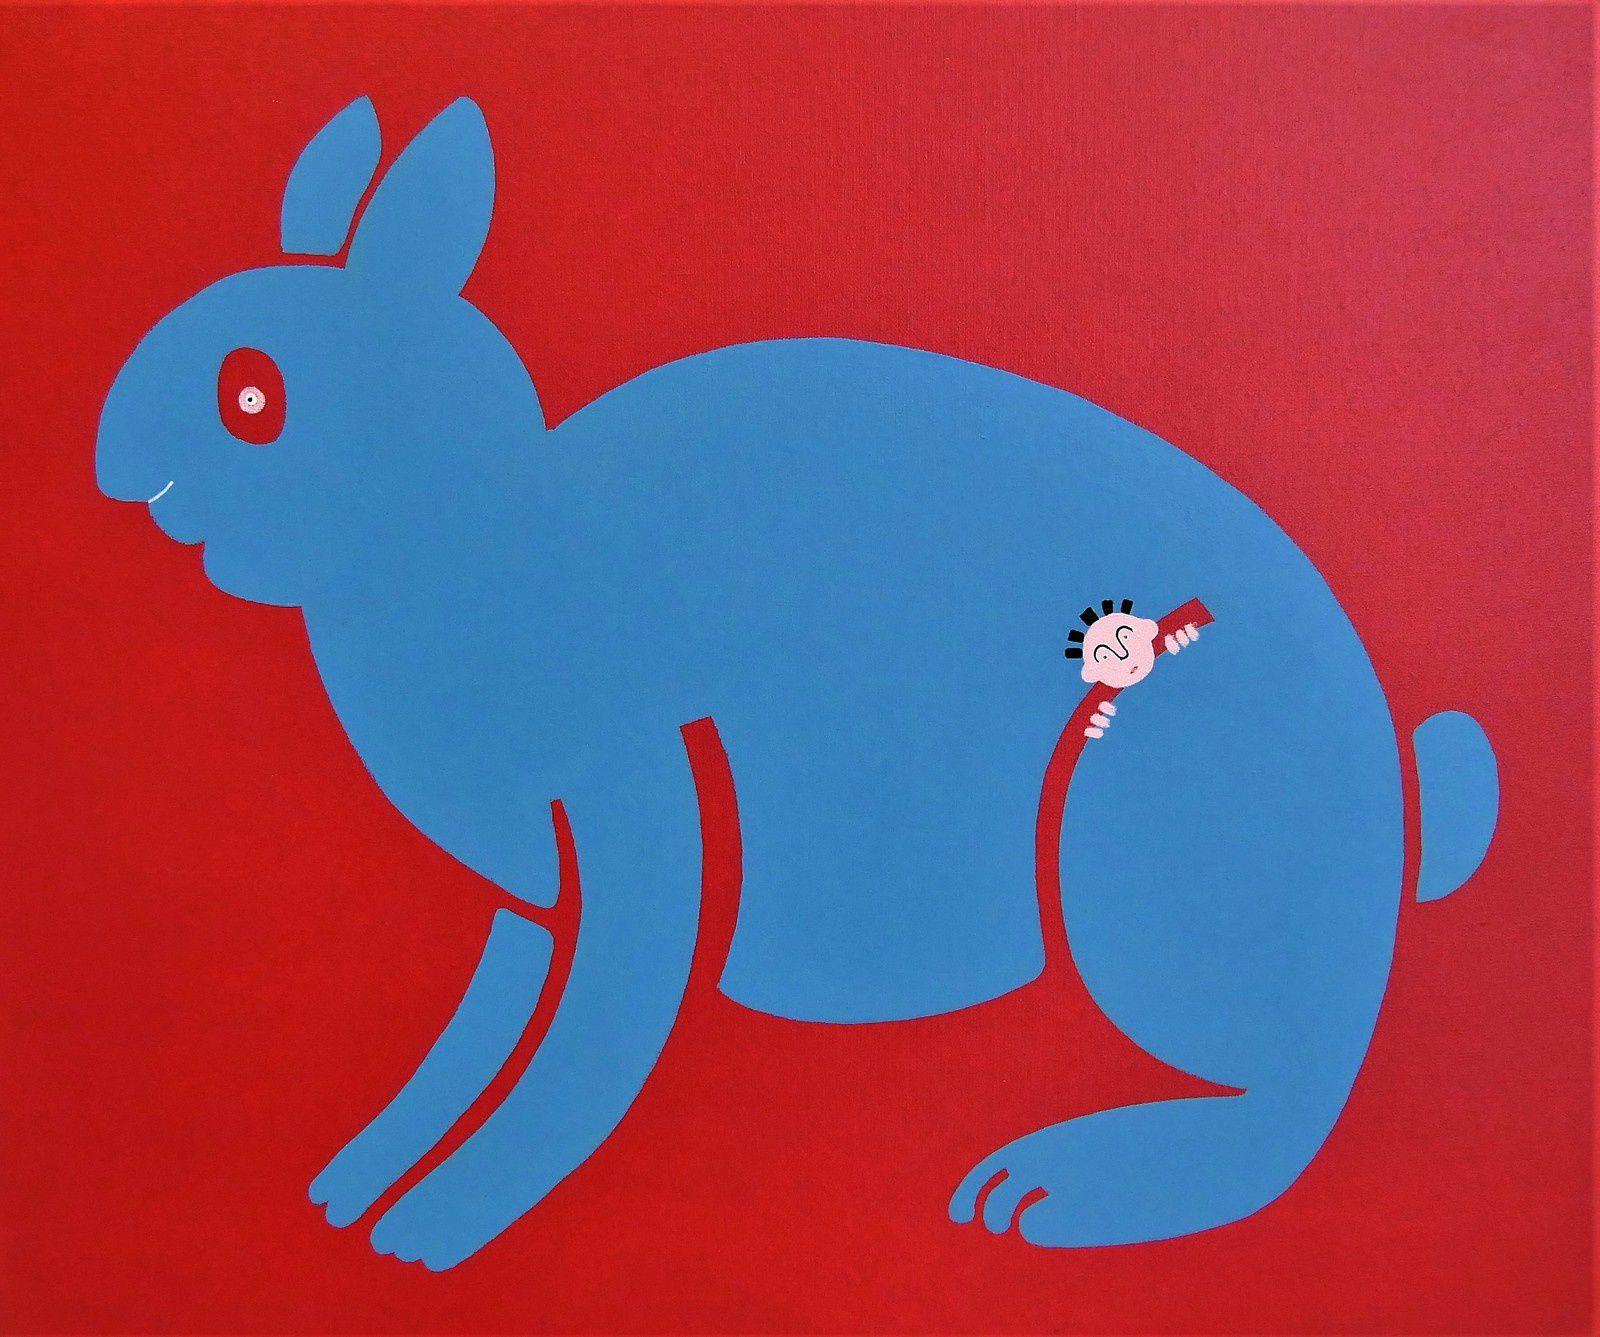 Peintures animaux et humains. Marylène Moquay. Exposition COMMUNION. Oléron. MARY.